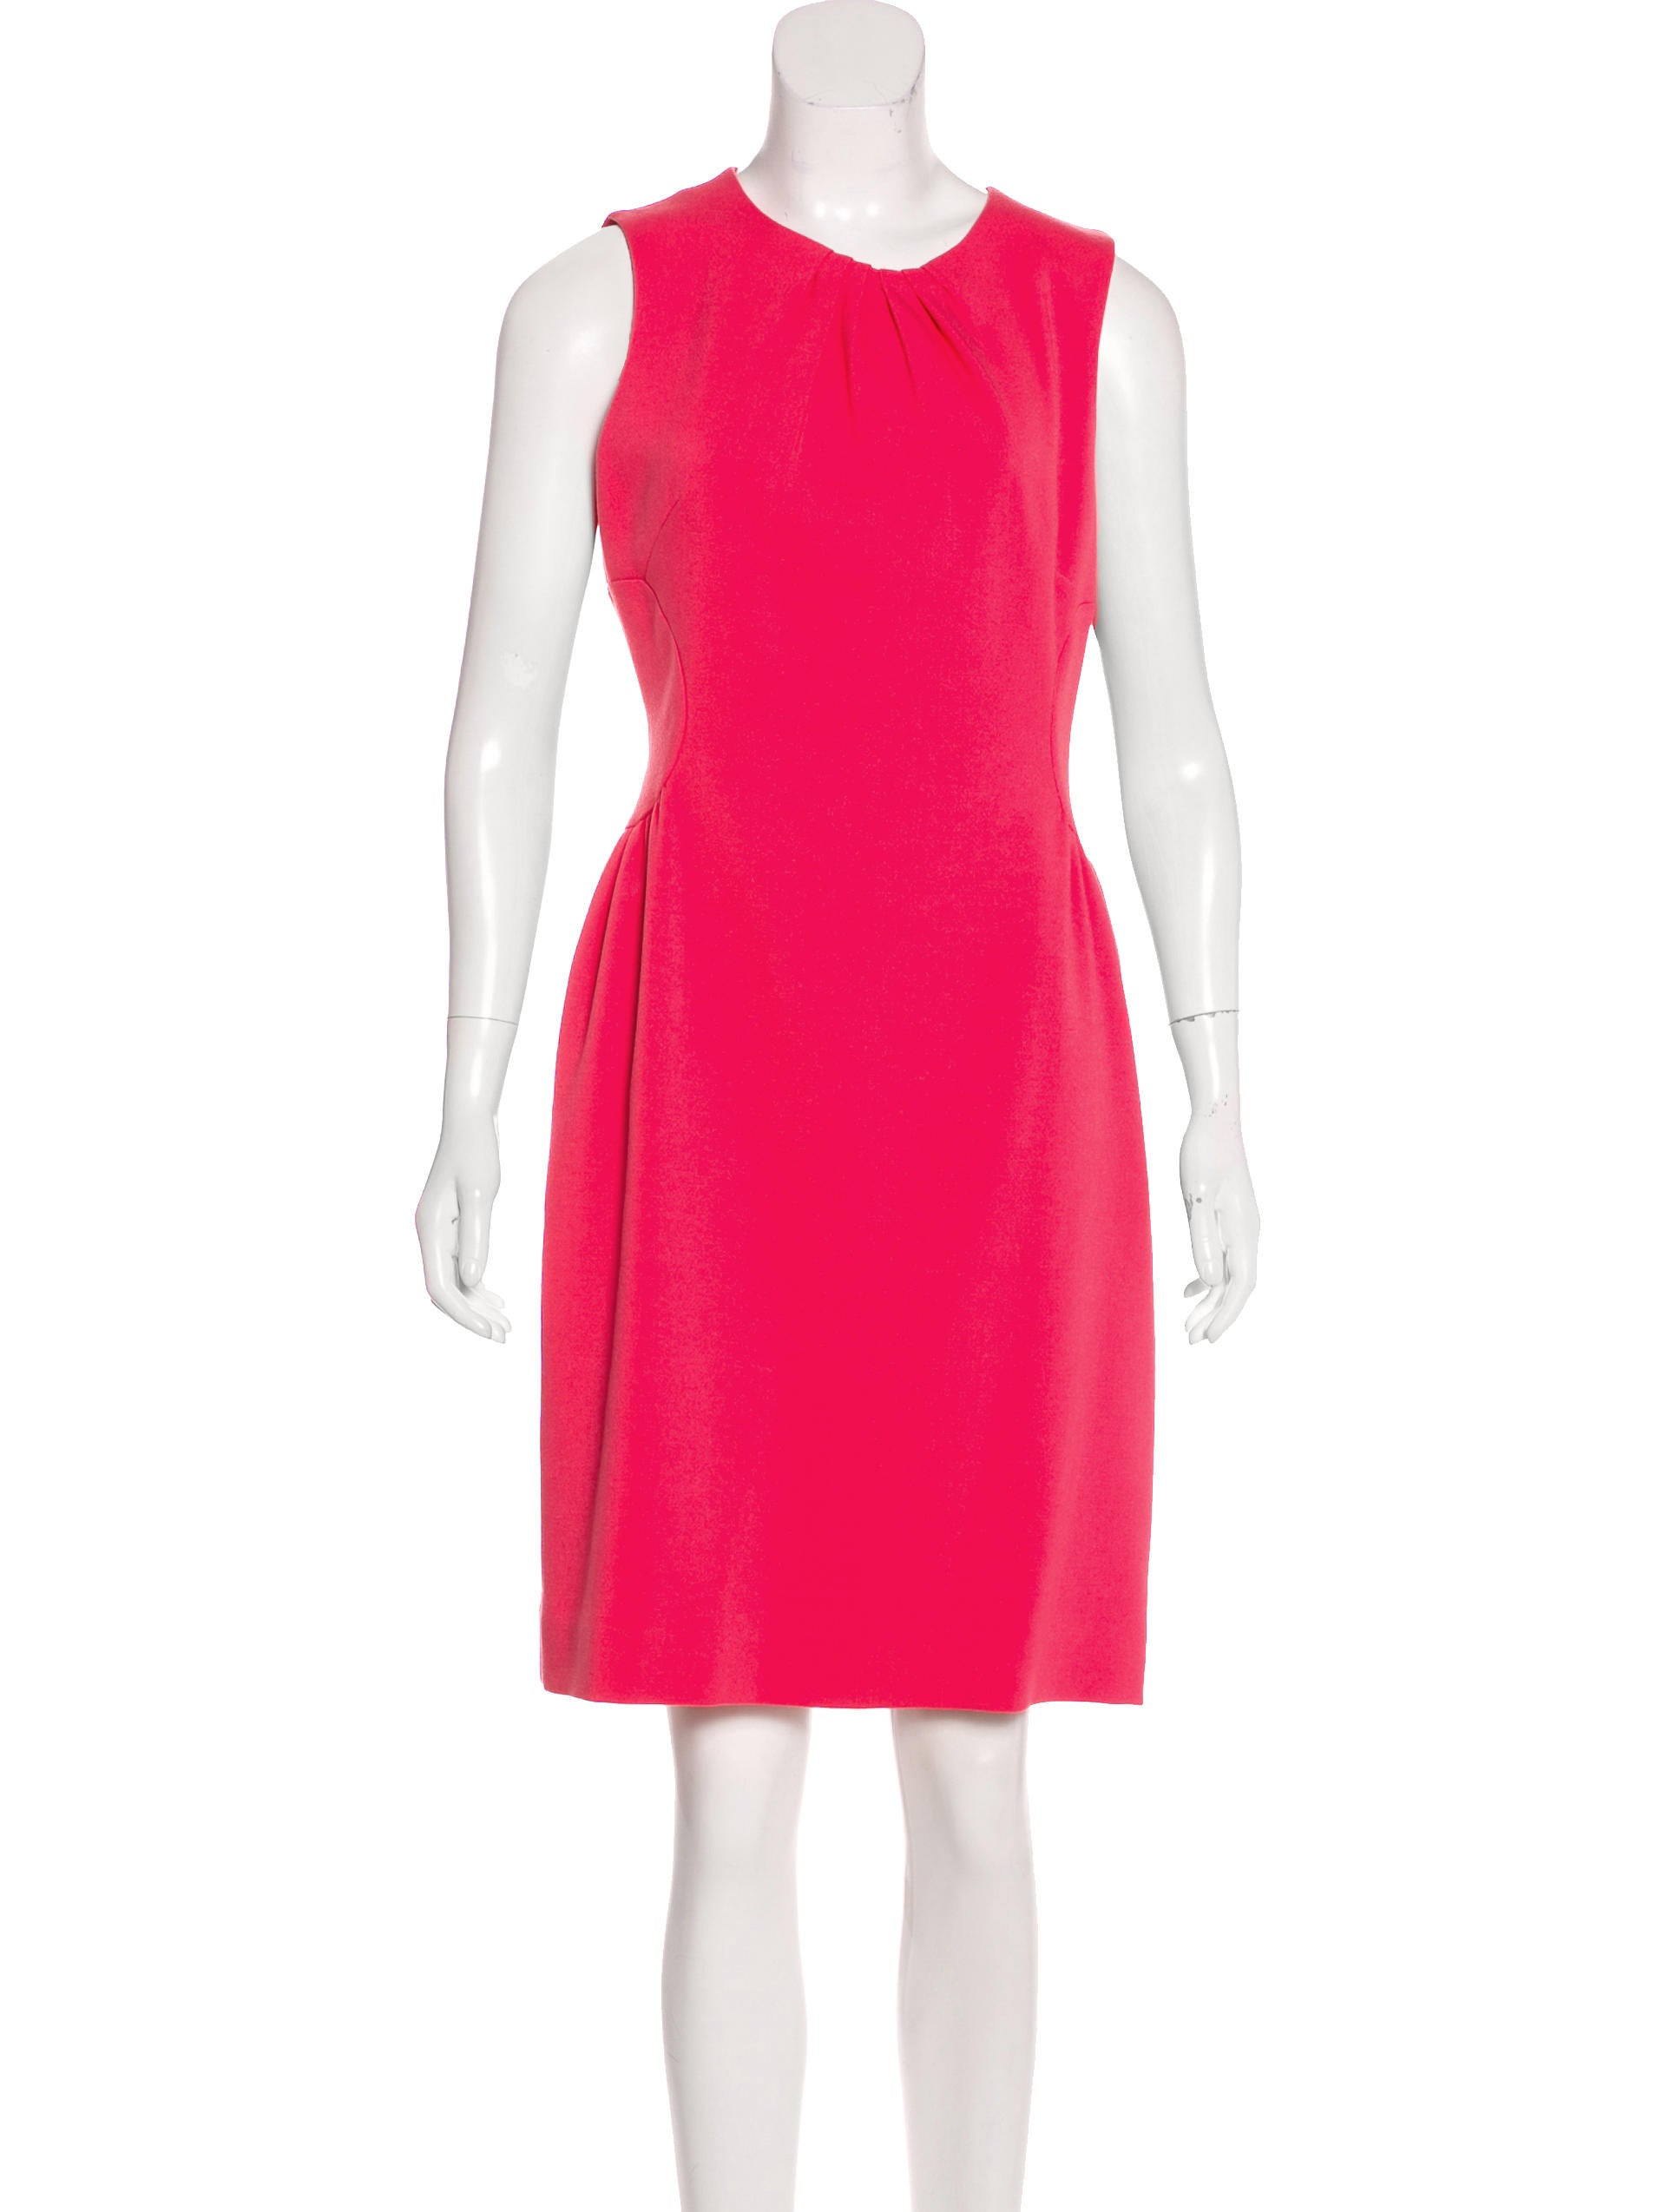 Sleeveless Knee Length Dress by Kate Spade New York